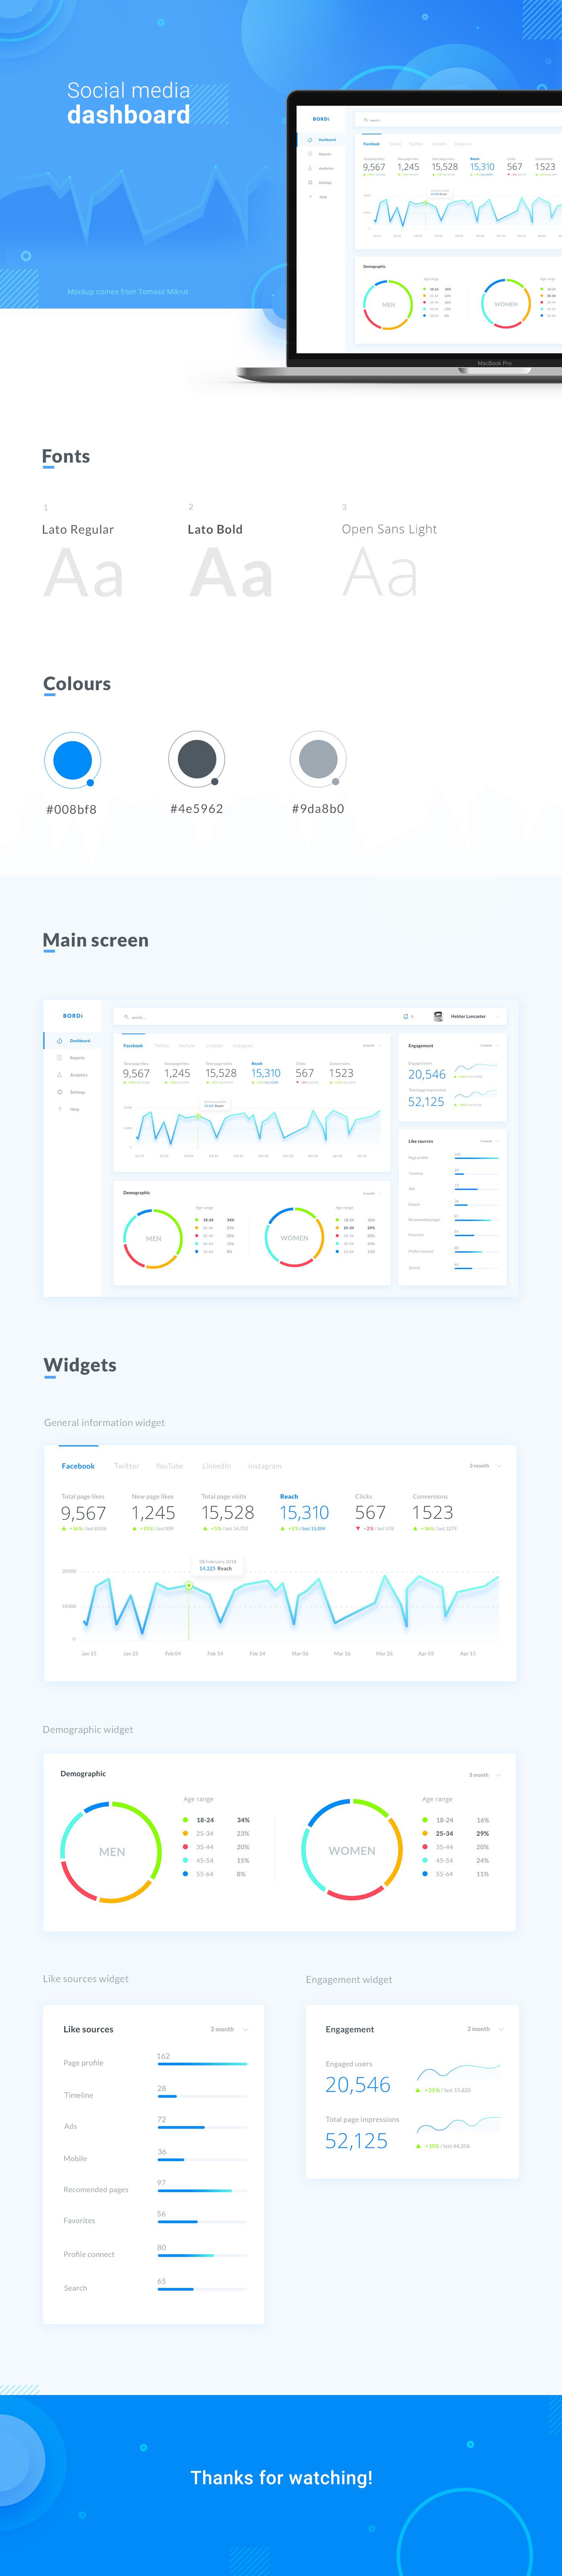 dashboard Webdesign UI ui design Web concept photoshop social media